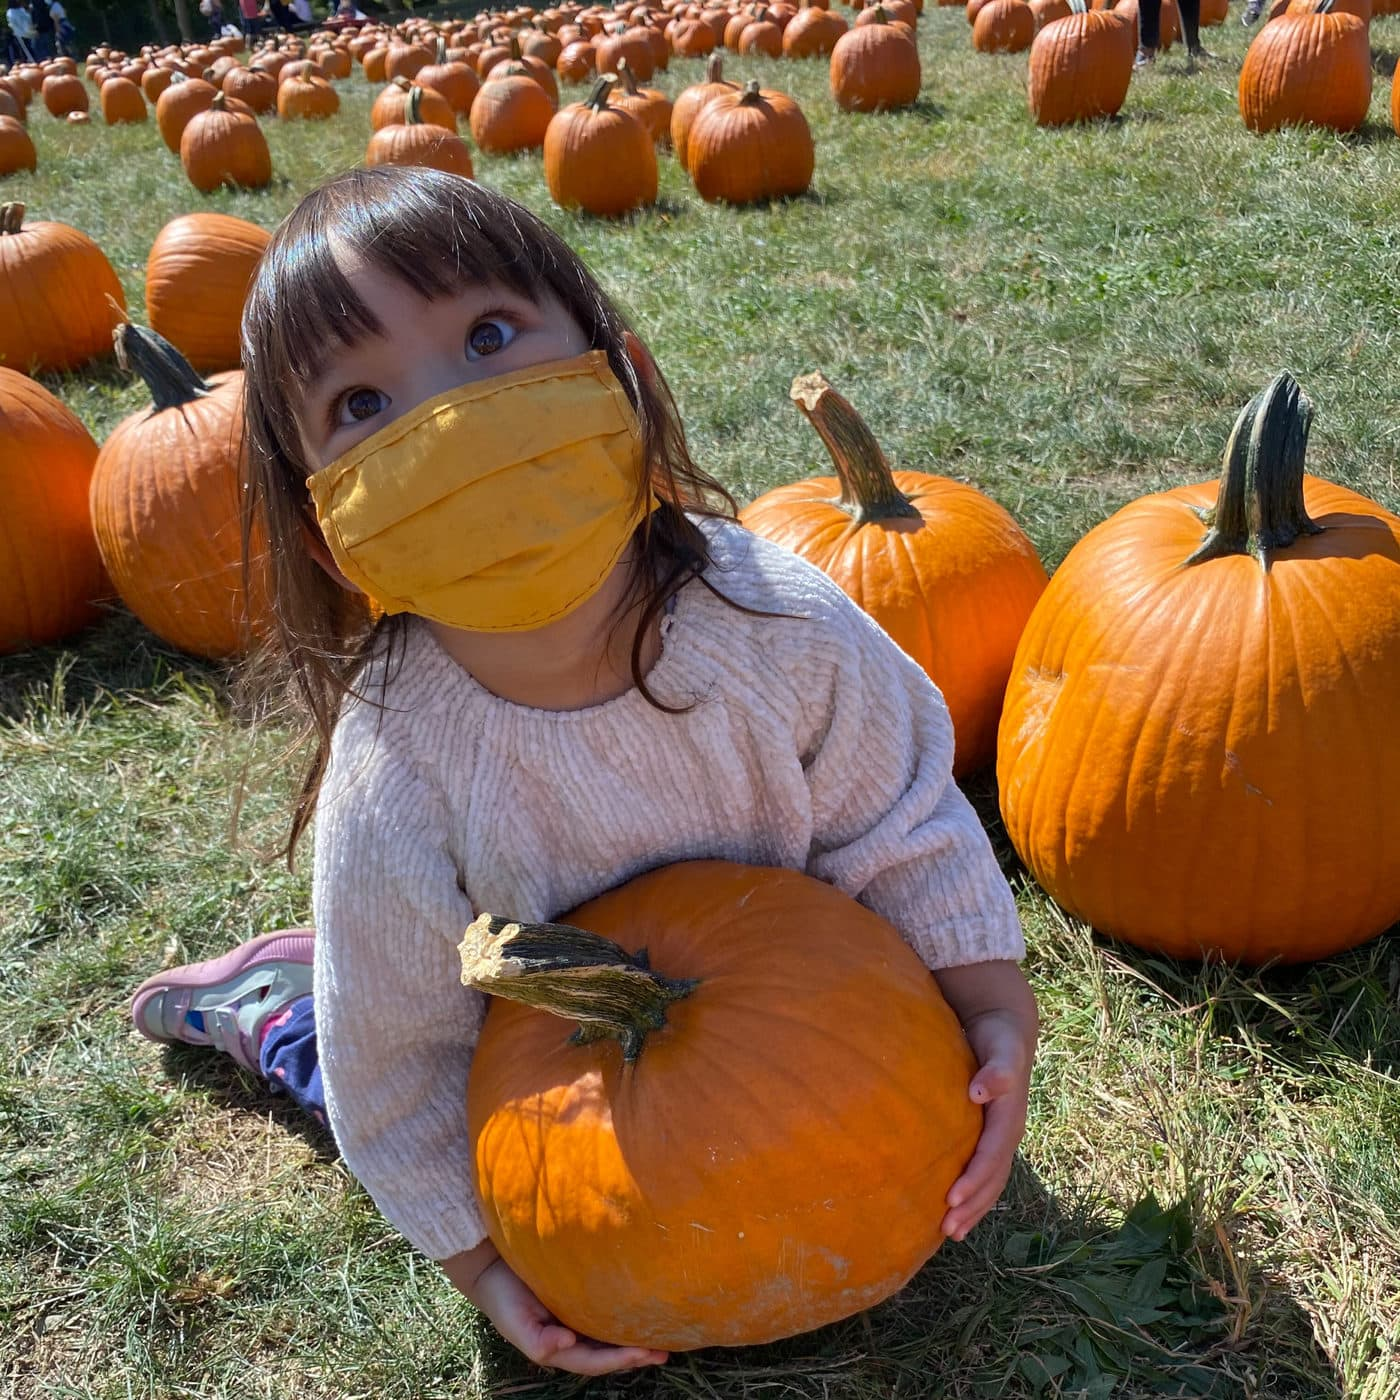 Pumpkin Patch at Dubois Farms